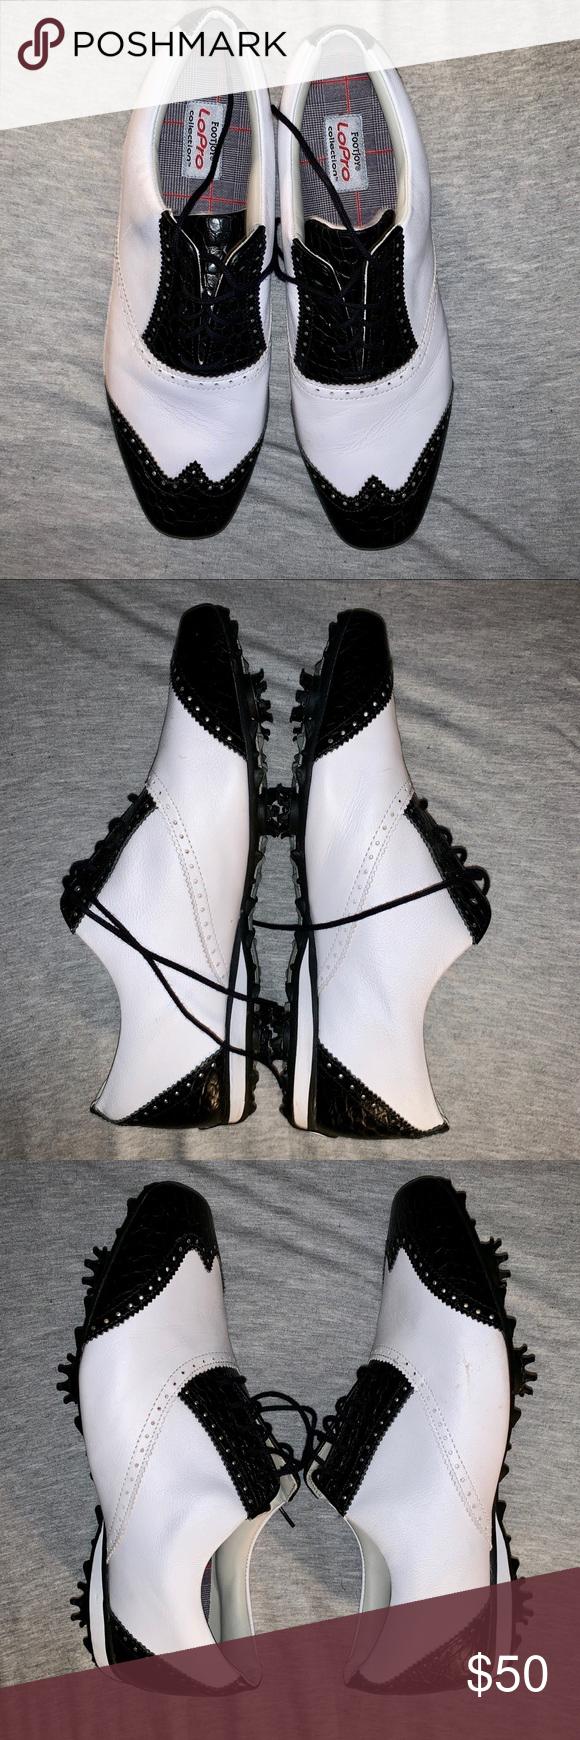 FootJoy LoPro women s golf shoes size 12 Women s FootJoy LoPro Gold Shoes. Size  12. Only worn 1-2 times. FootJoy Shoes Athletic Shoes fa17b9a30